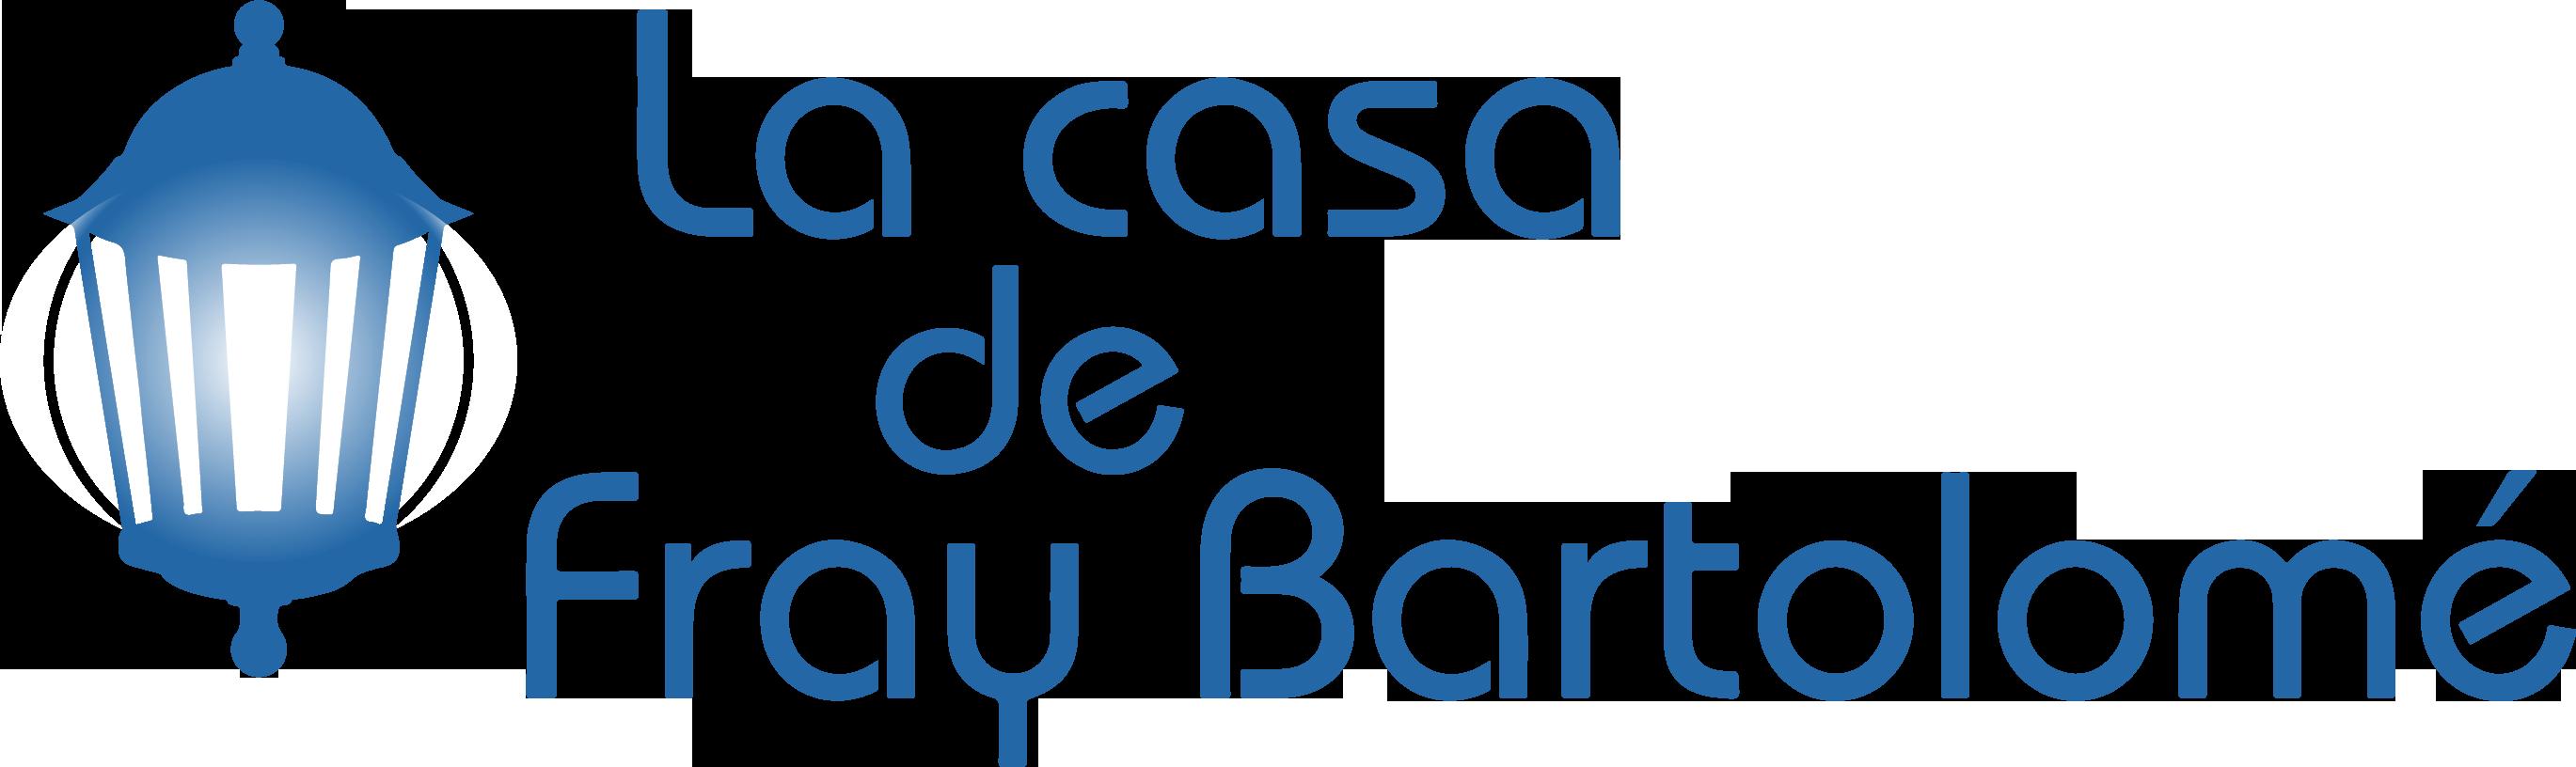 La Casa de Fray Bartolomé